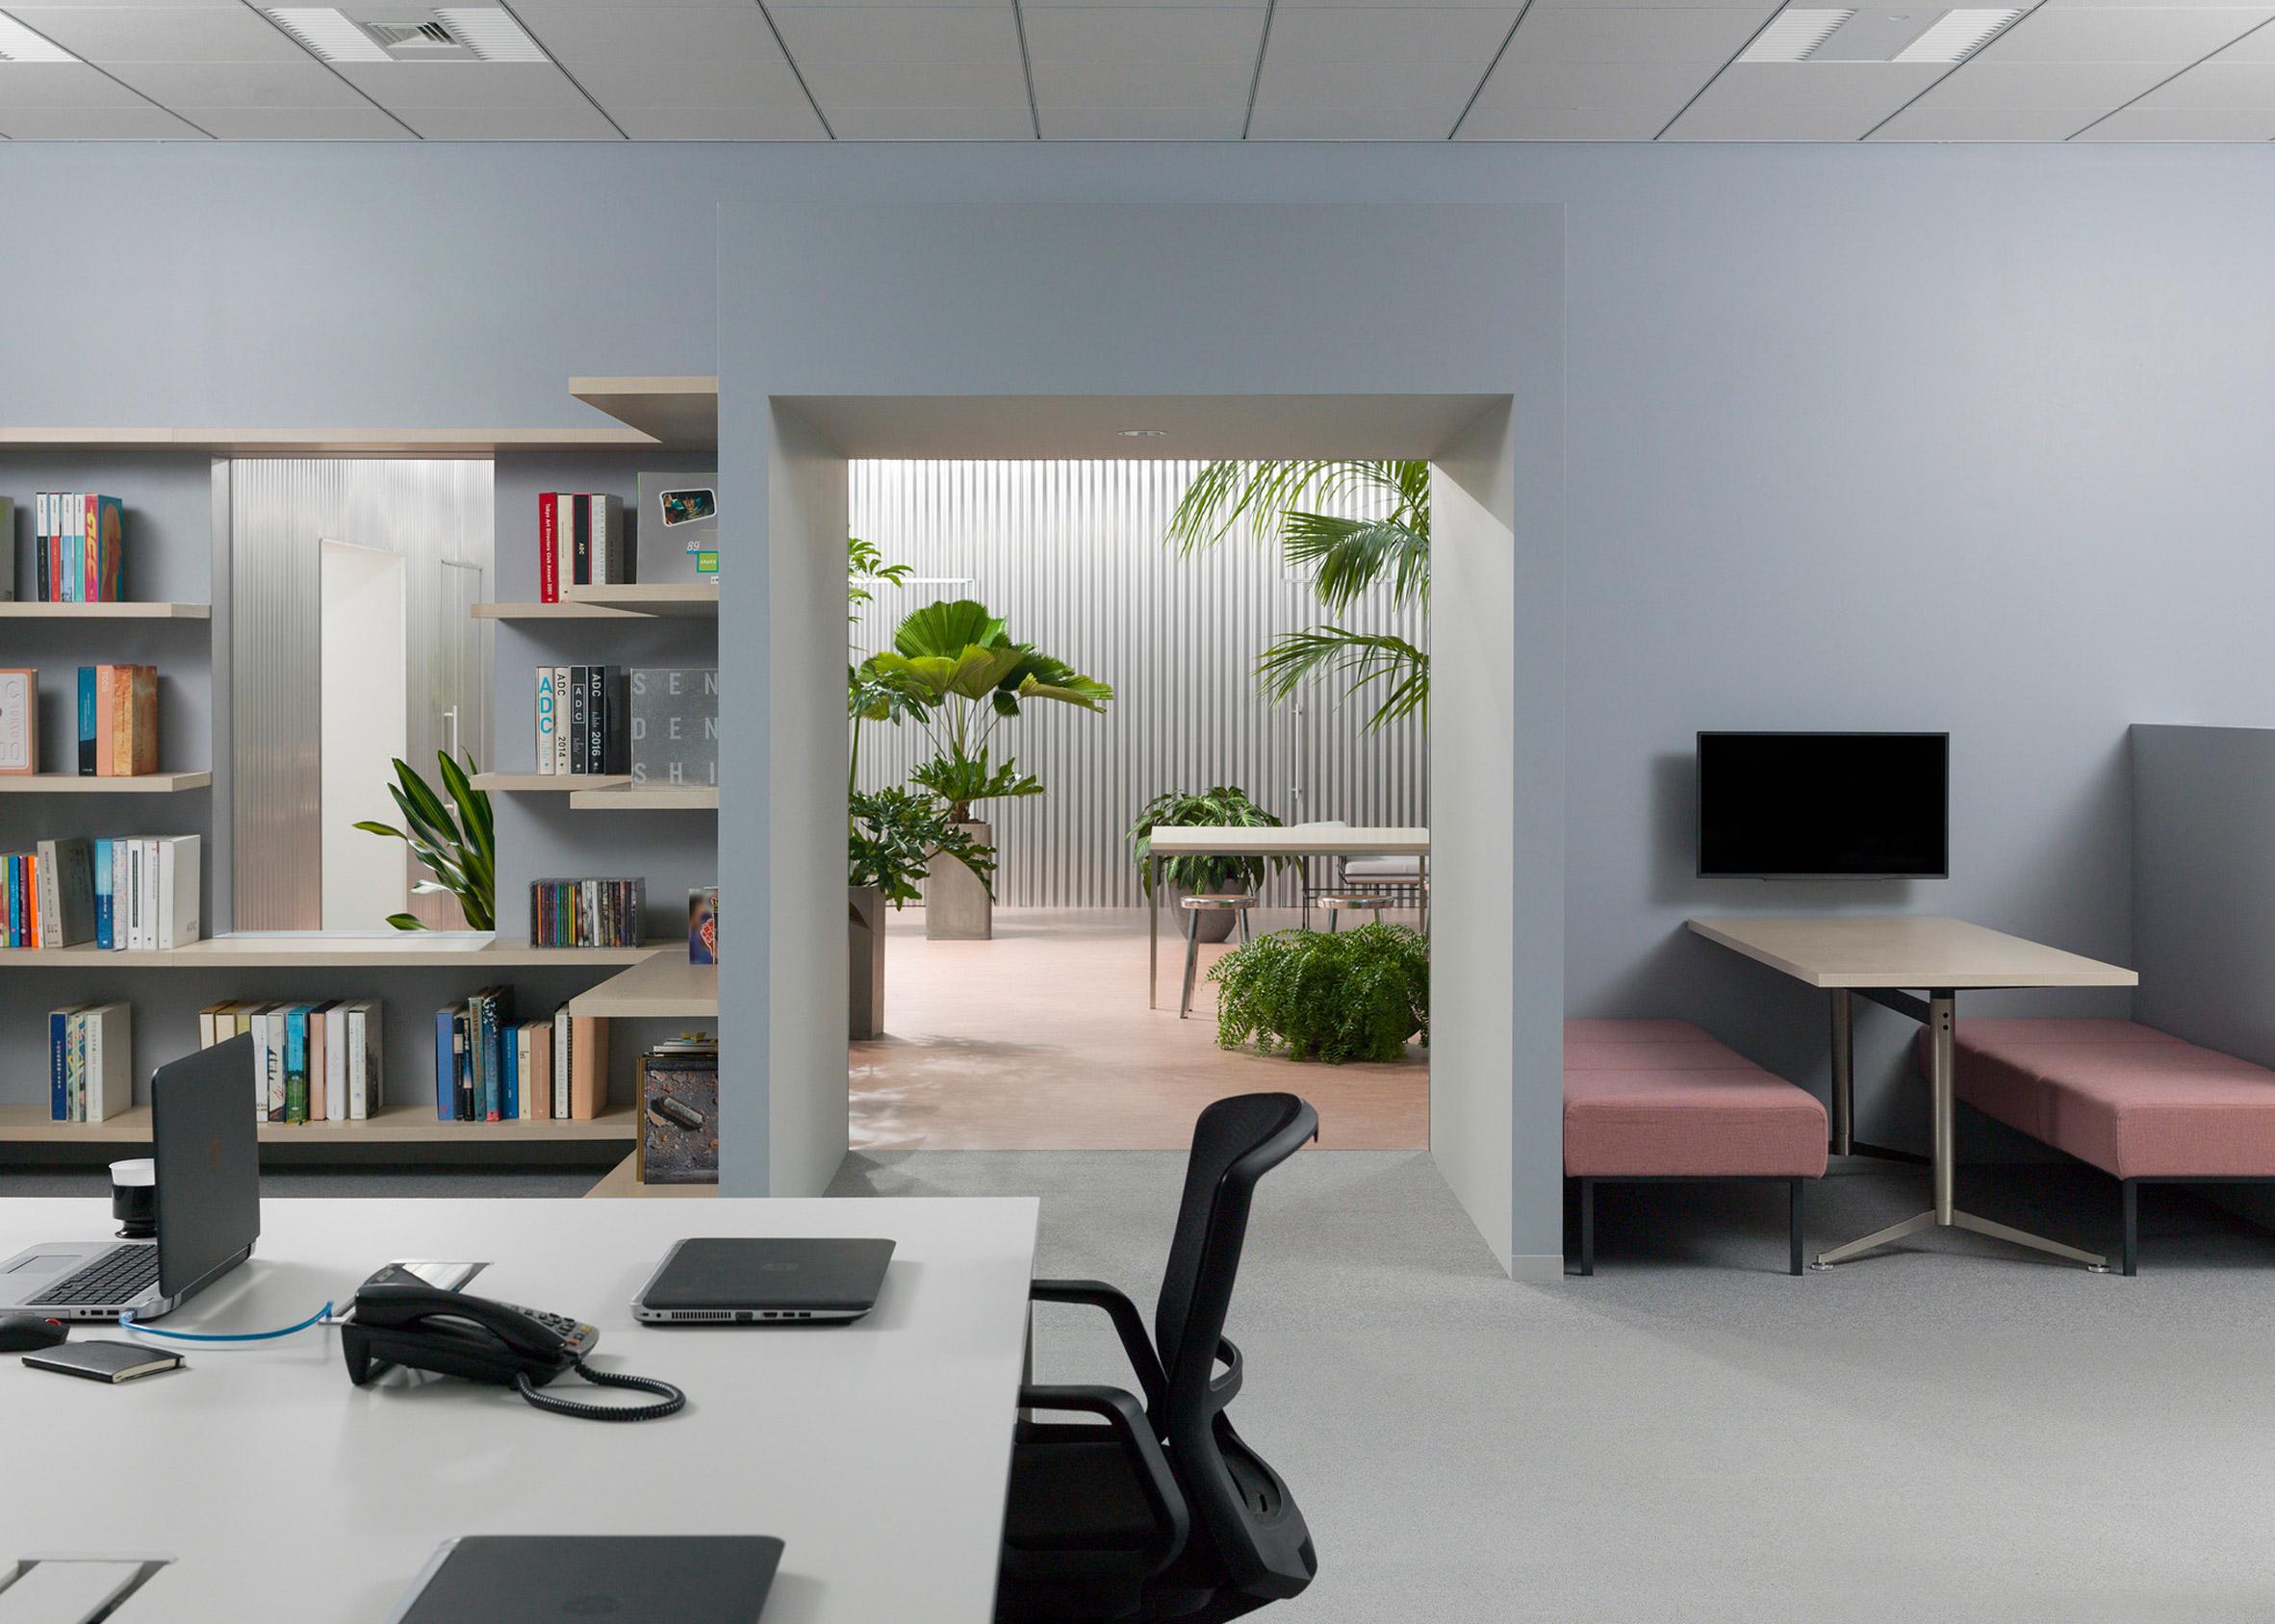 Dezeen Awards interiors winners: Office with a Patio by Shogo Onodera and Tsukasa Okada